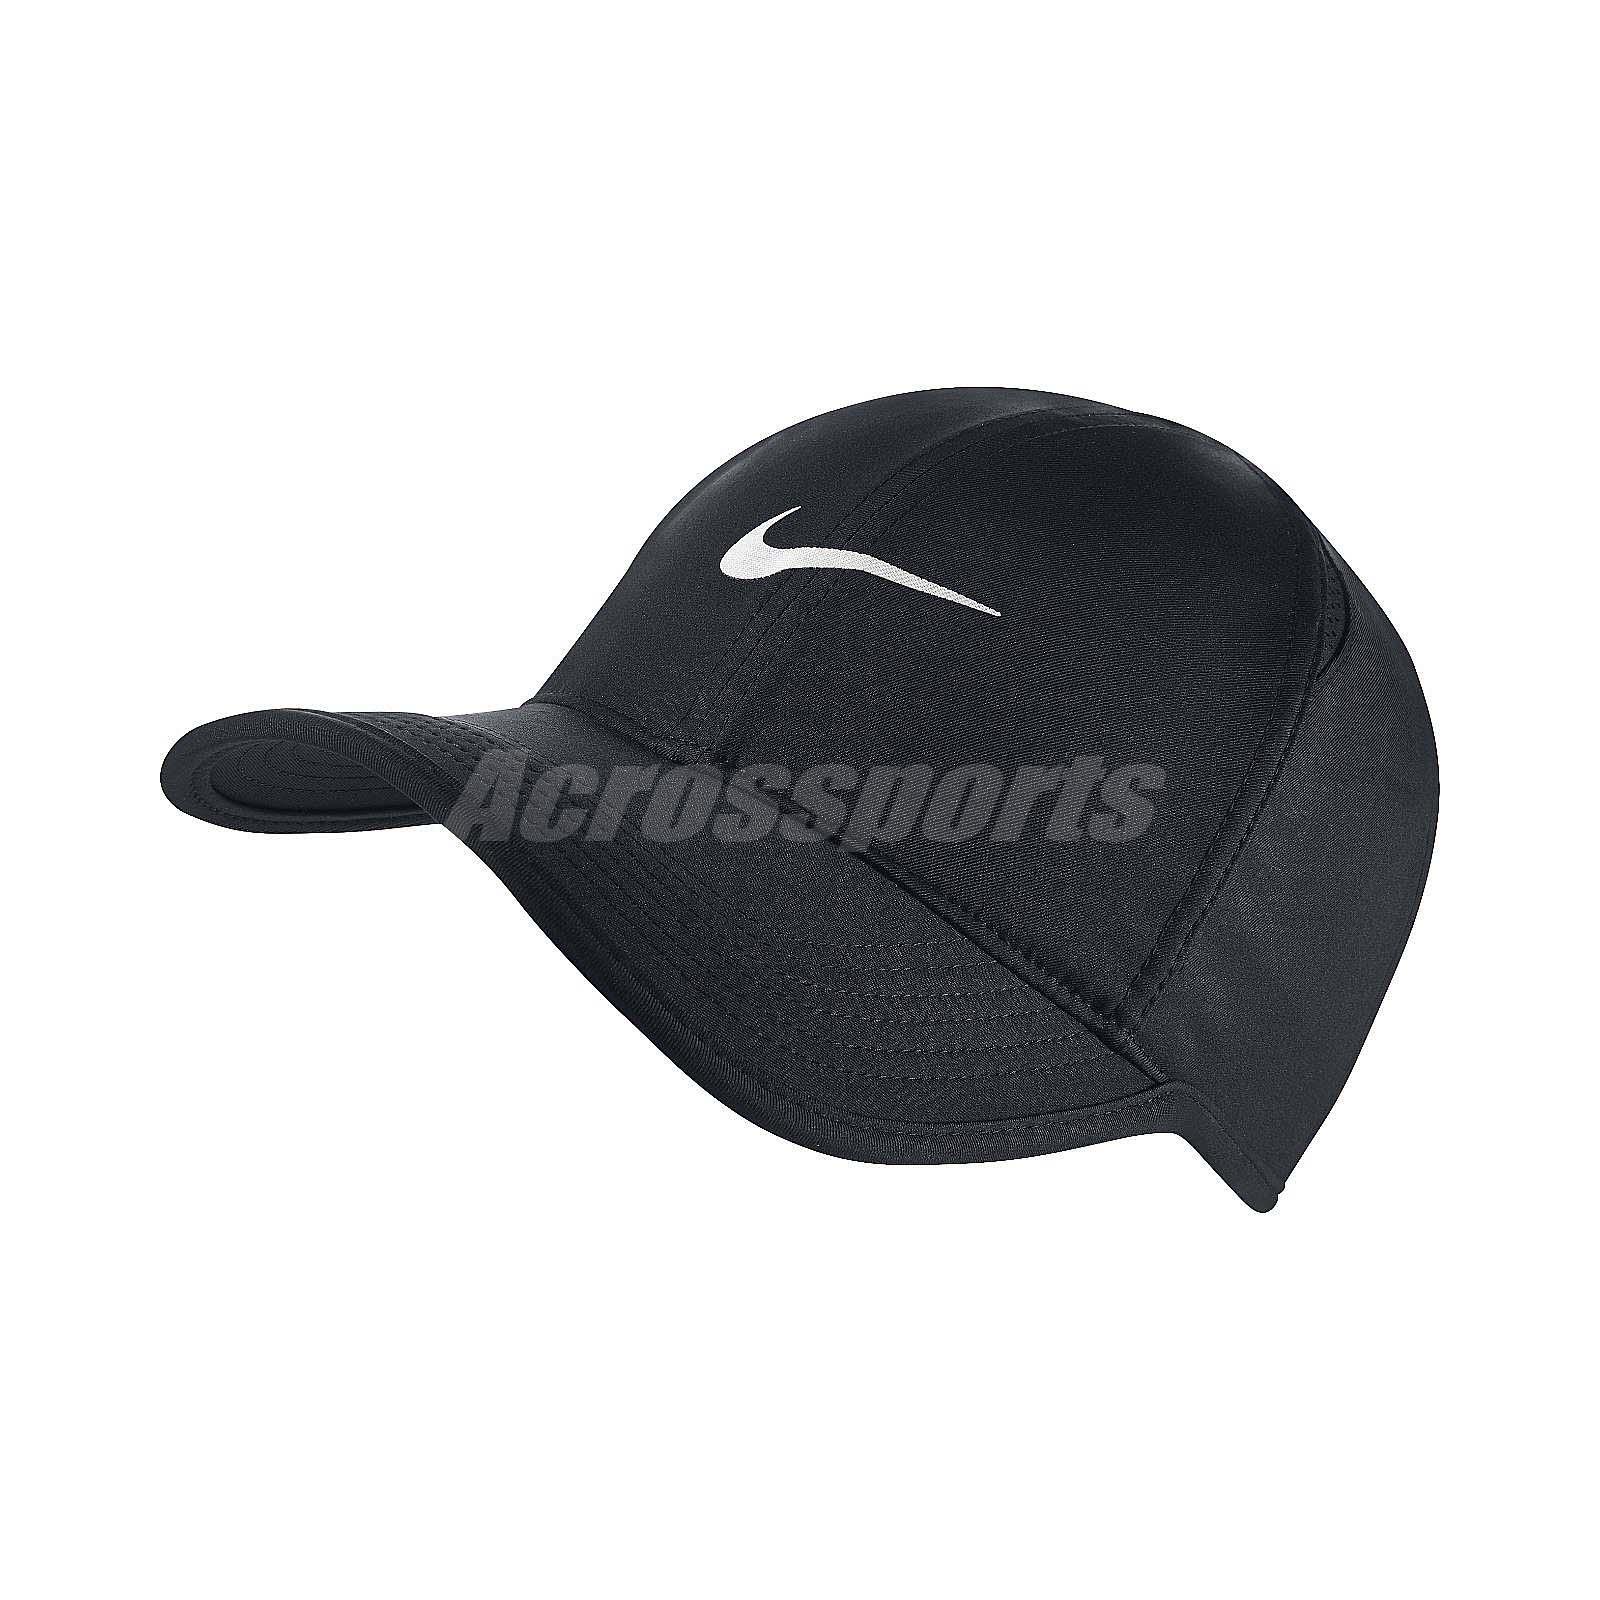 e395bcb364 Nike Aerobill Featherlight Dri-FIT Black White Unisex Tennis Cap Hat  679421-010